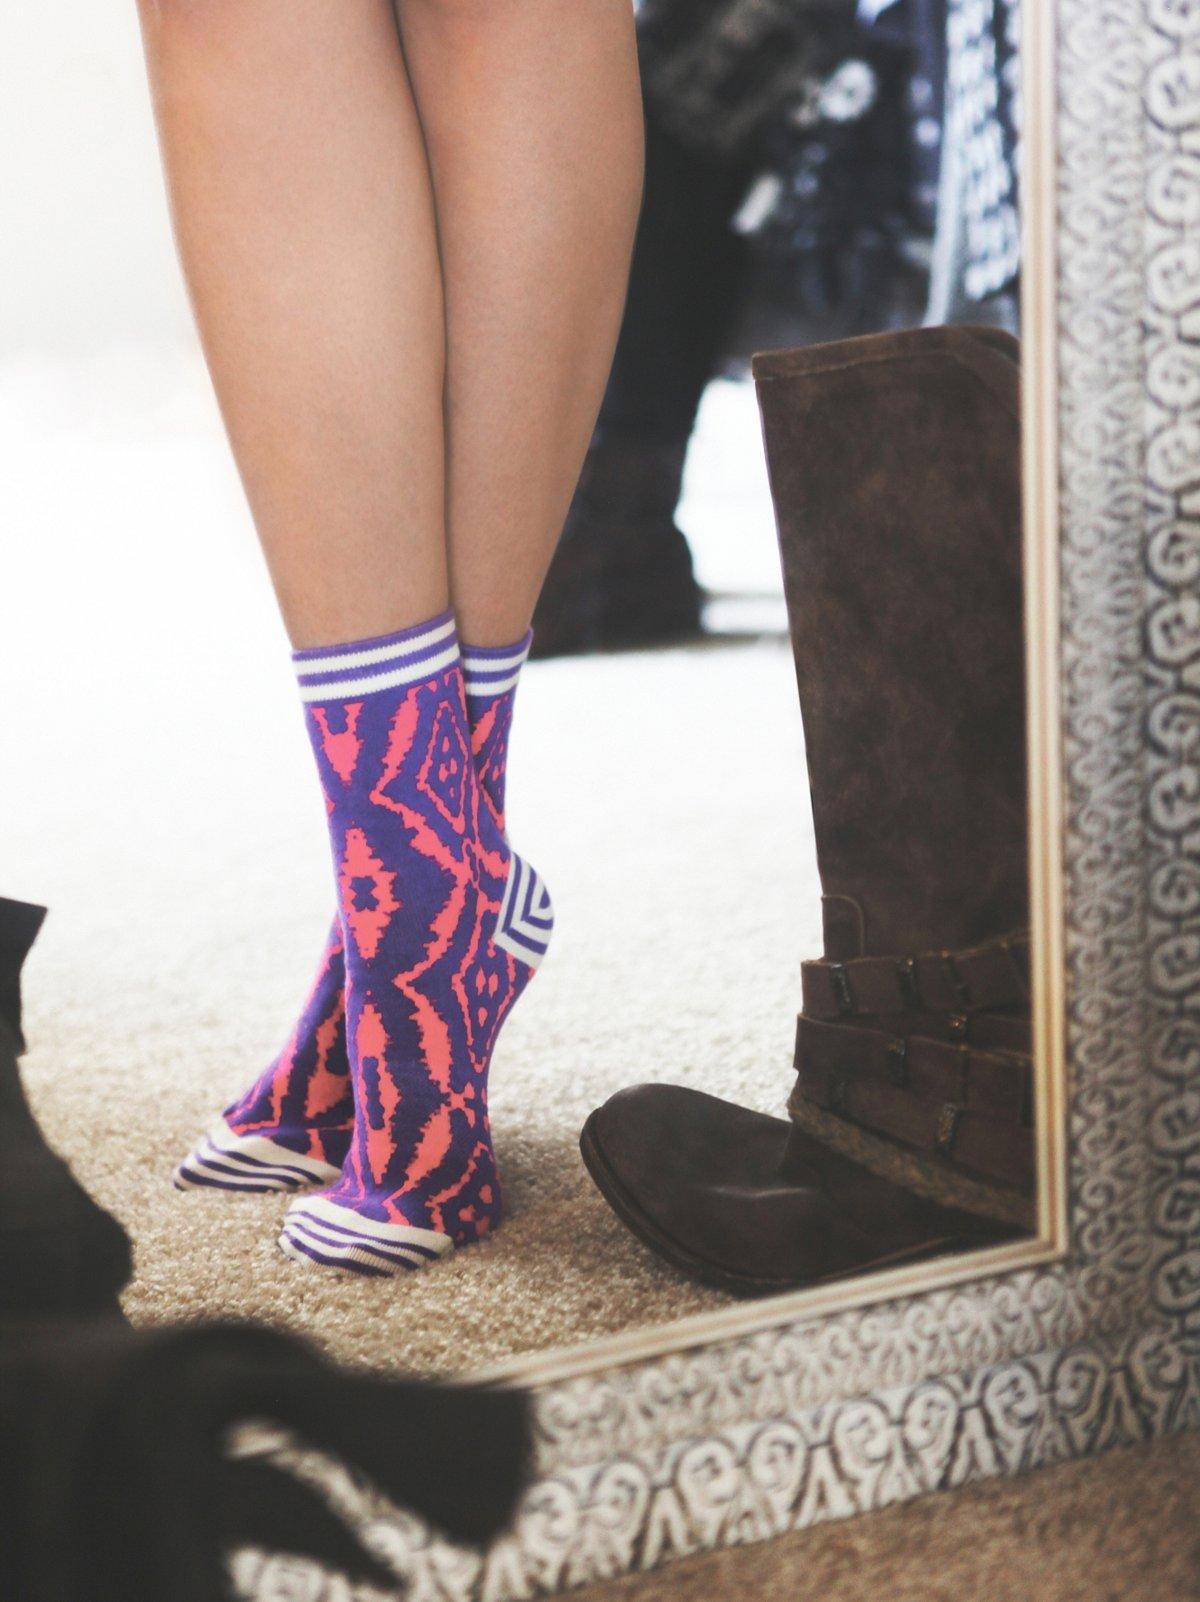 Bali Ankle Sock